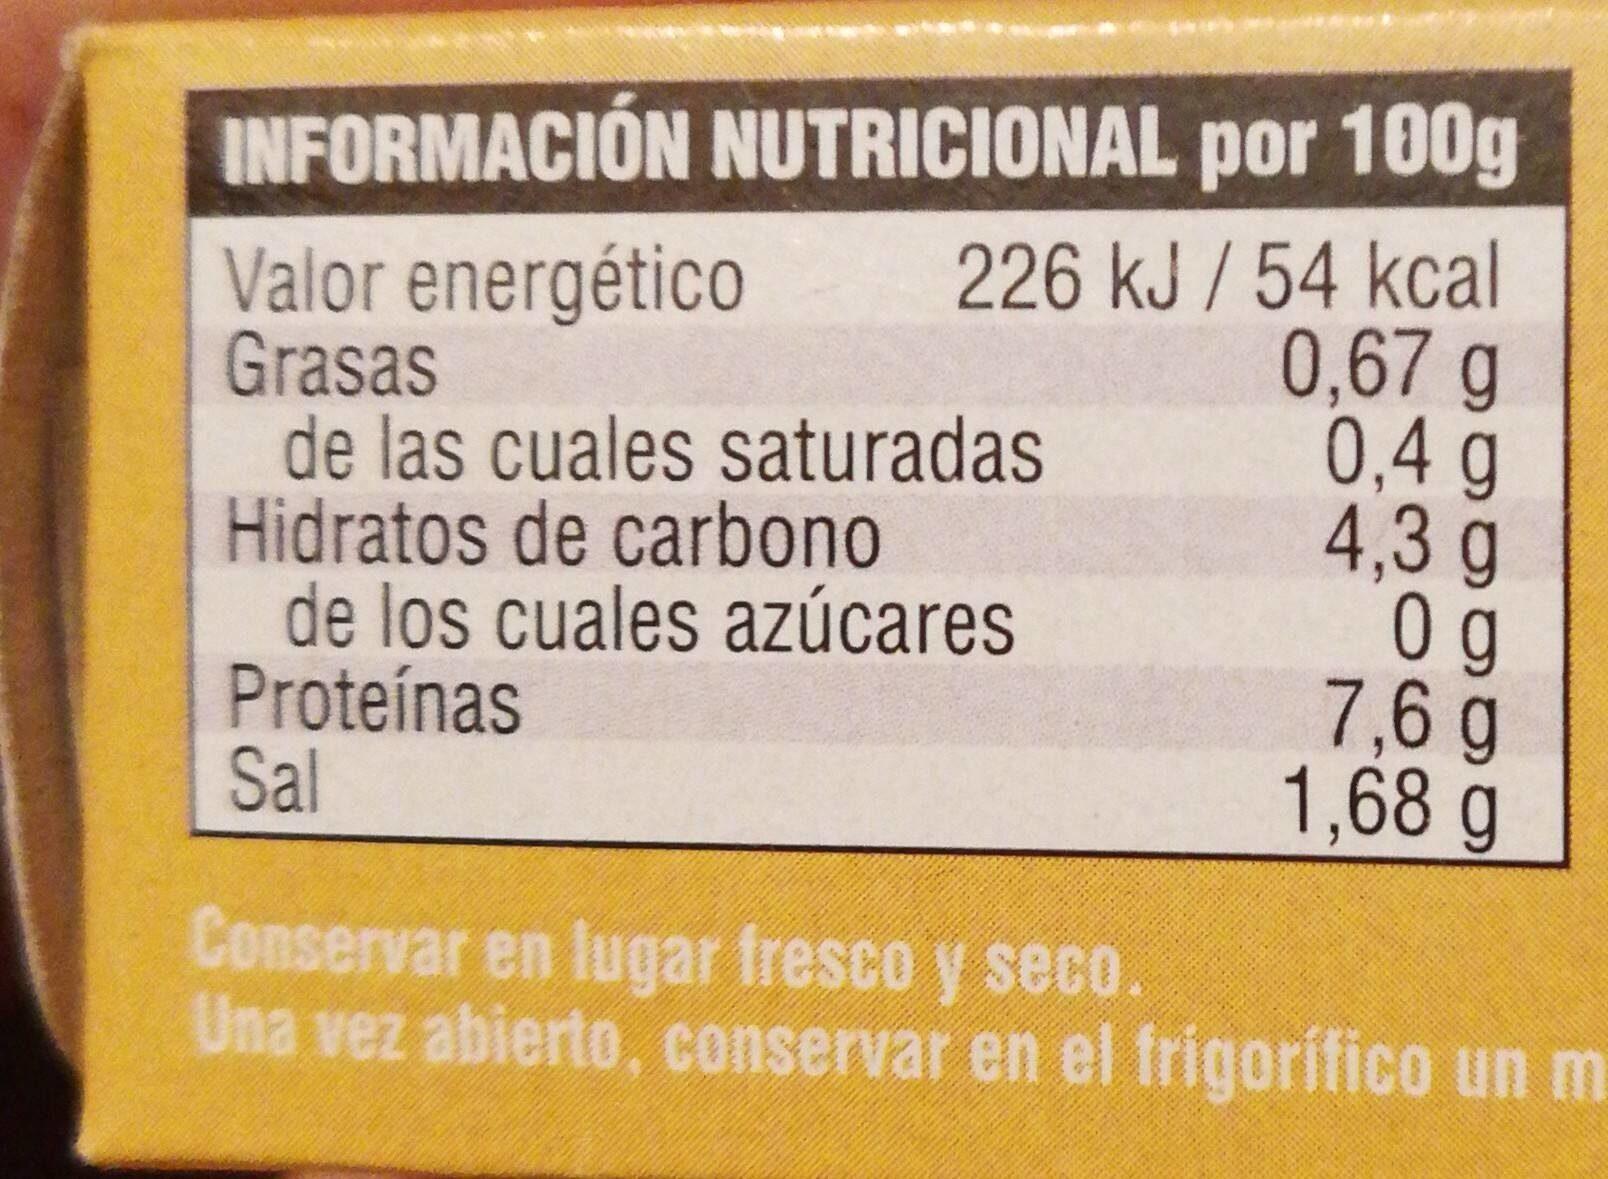 Berberechos al natural - Informations nutritionnelles - es